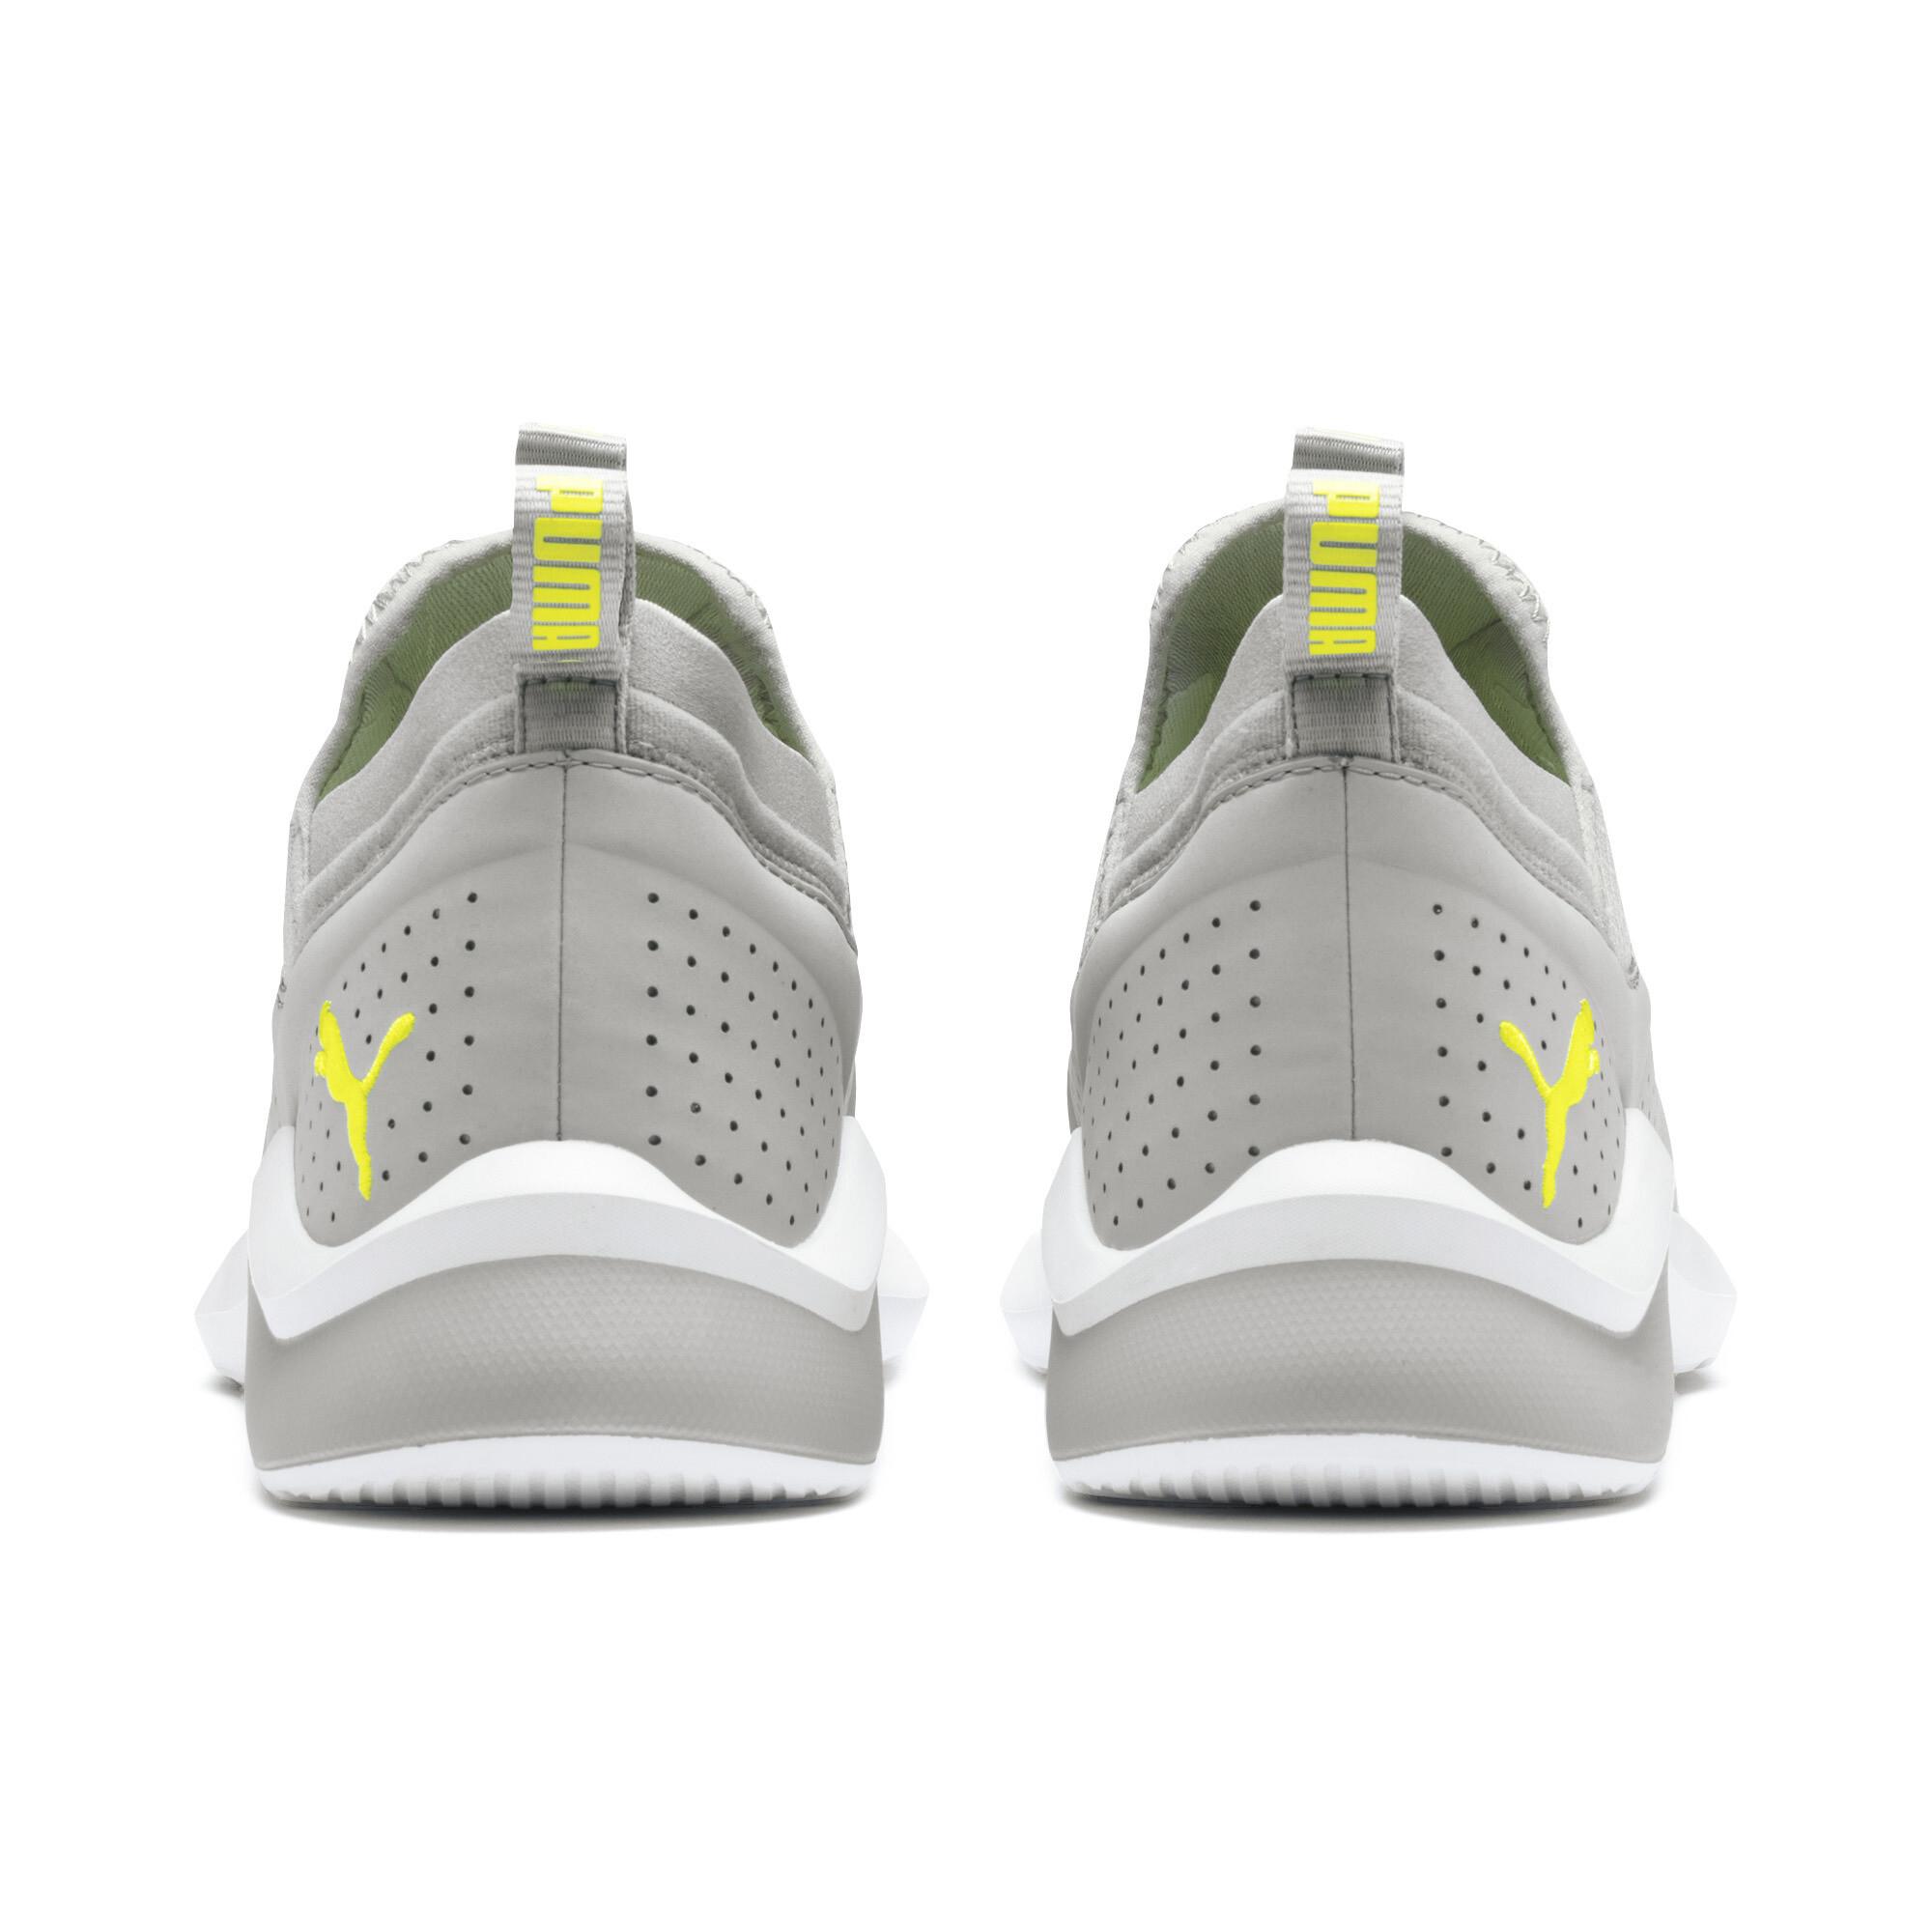 PUMA-Men-039-s-Emergence-Lights-Training-Shoes thumbnail 3